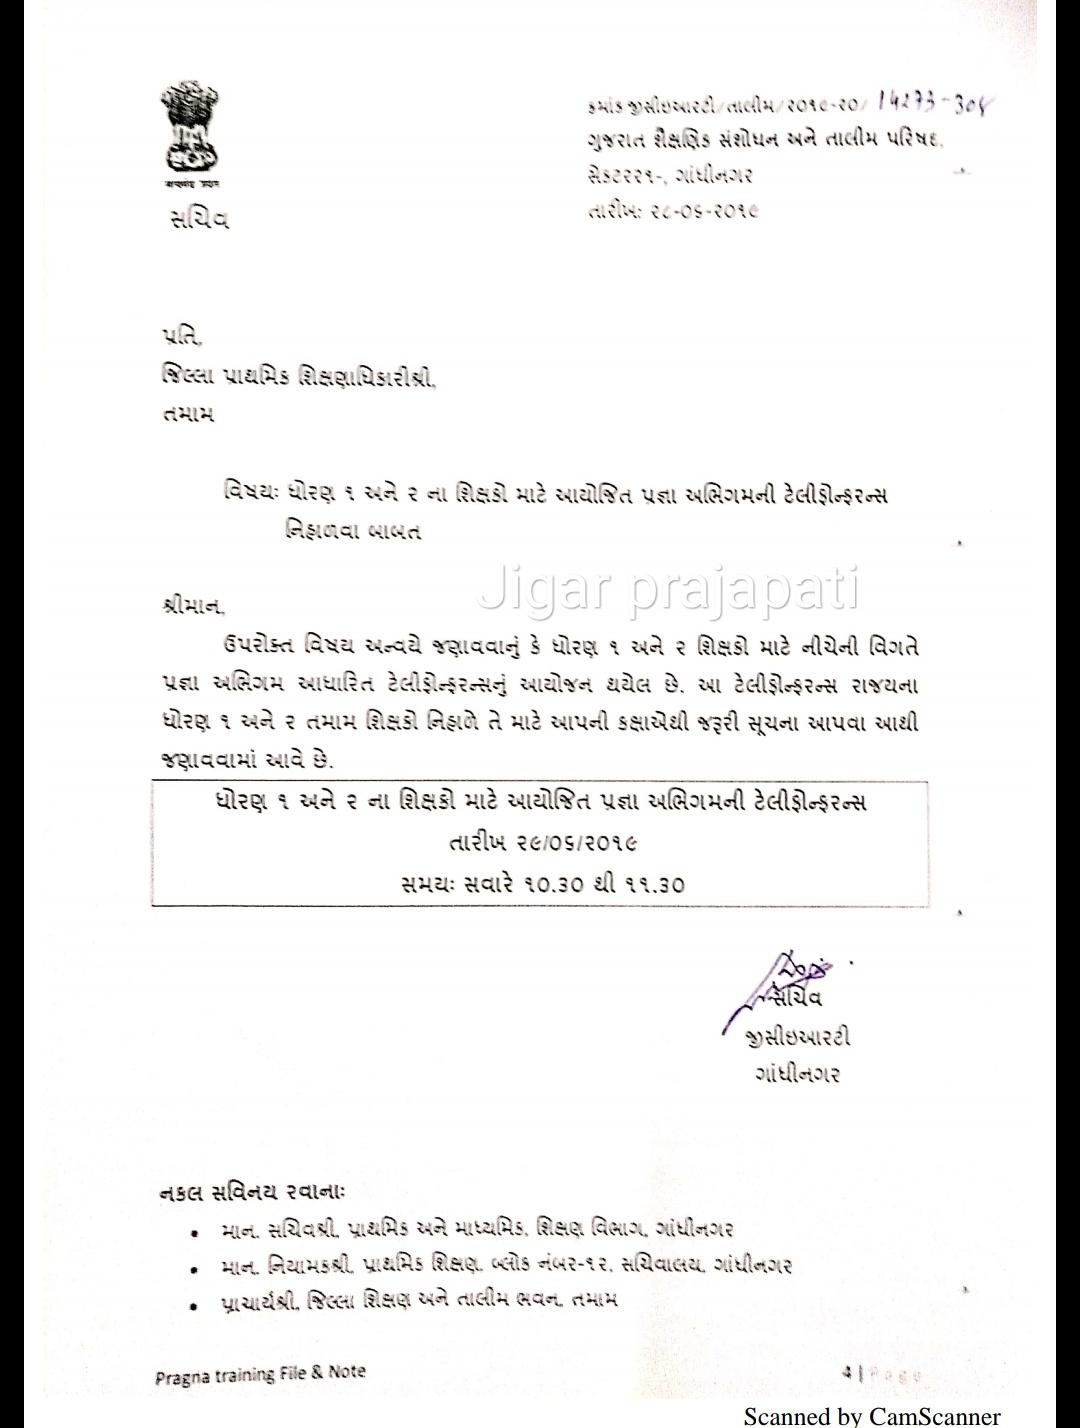 Pragna Abhigam std 1-2 Teleconference Jova babat gcert no Letter